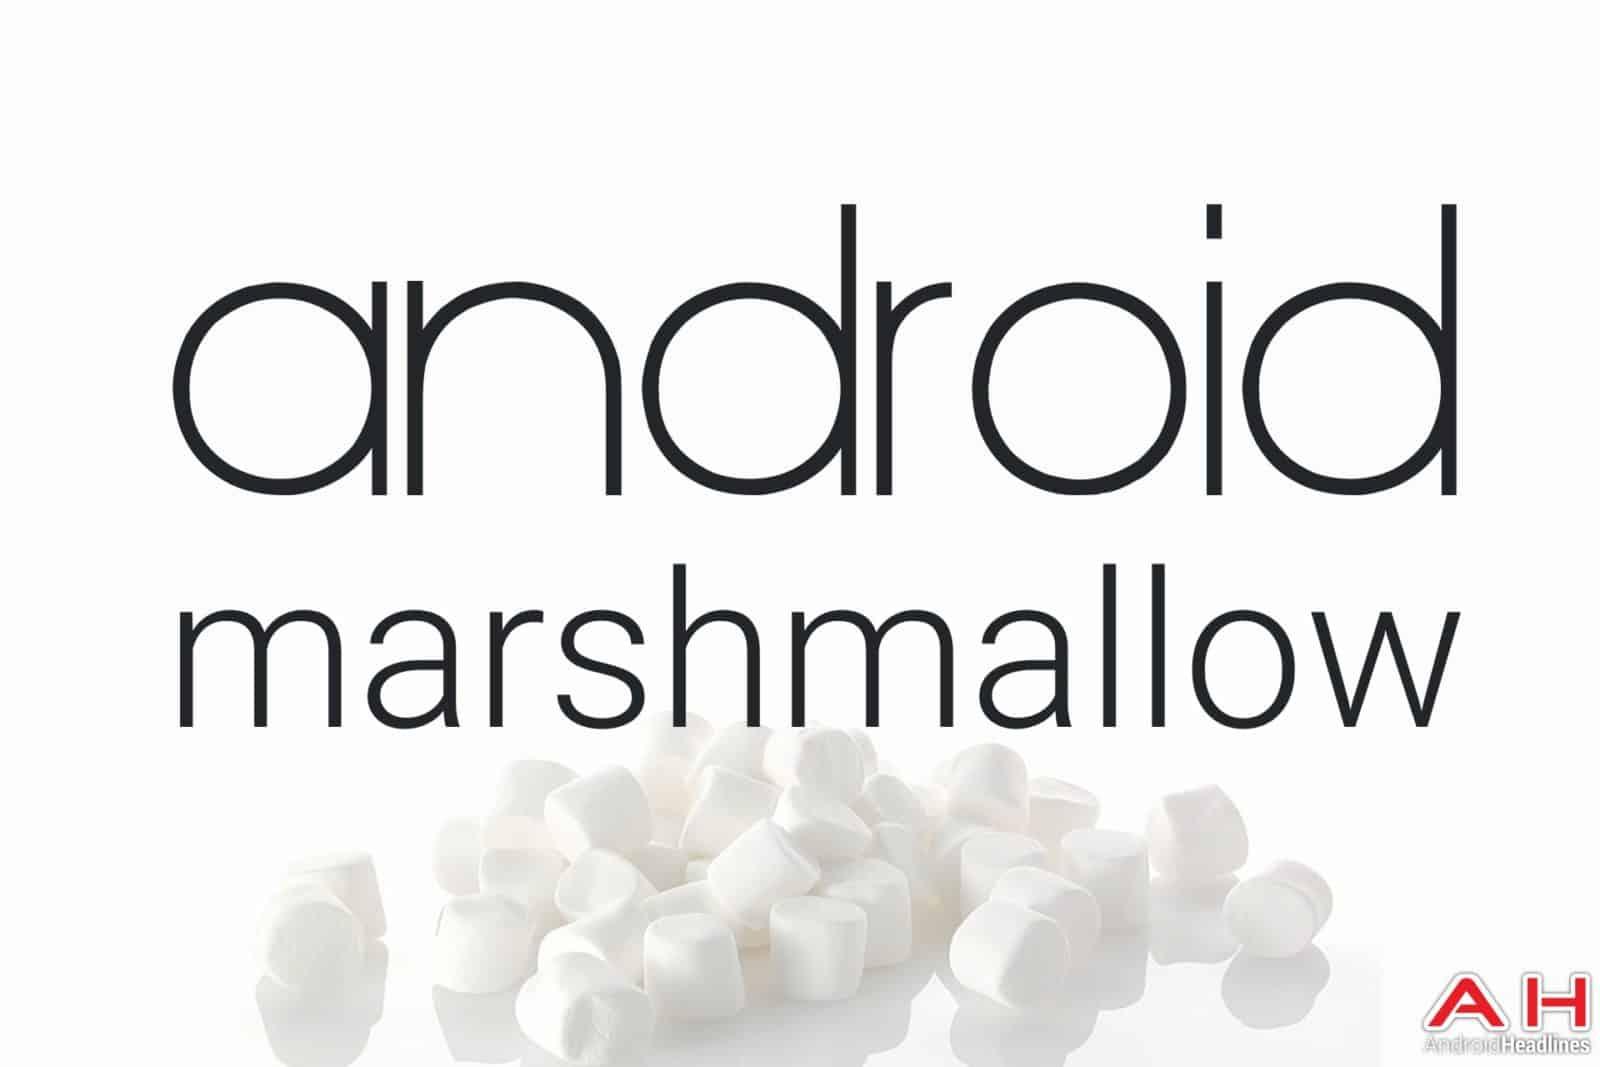 AH Android Marshmallow Logo 1.4